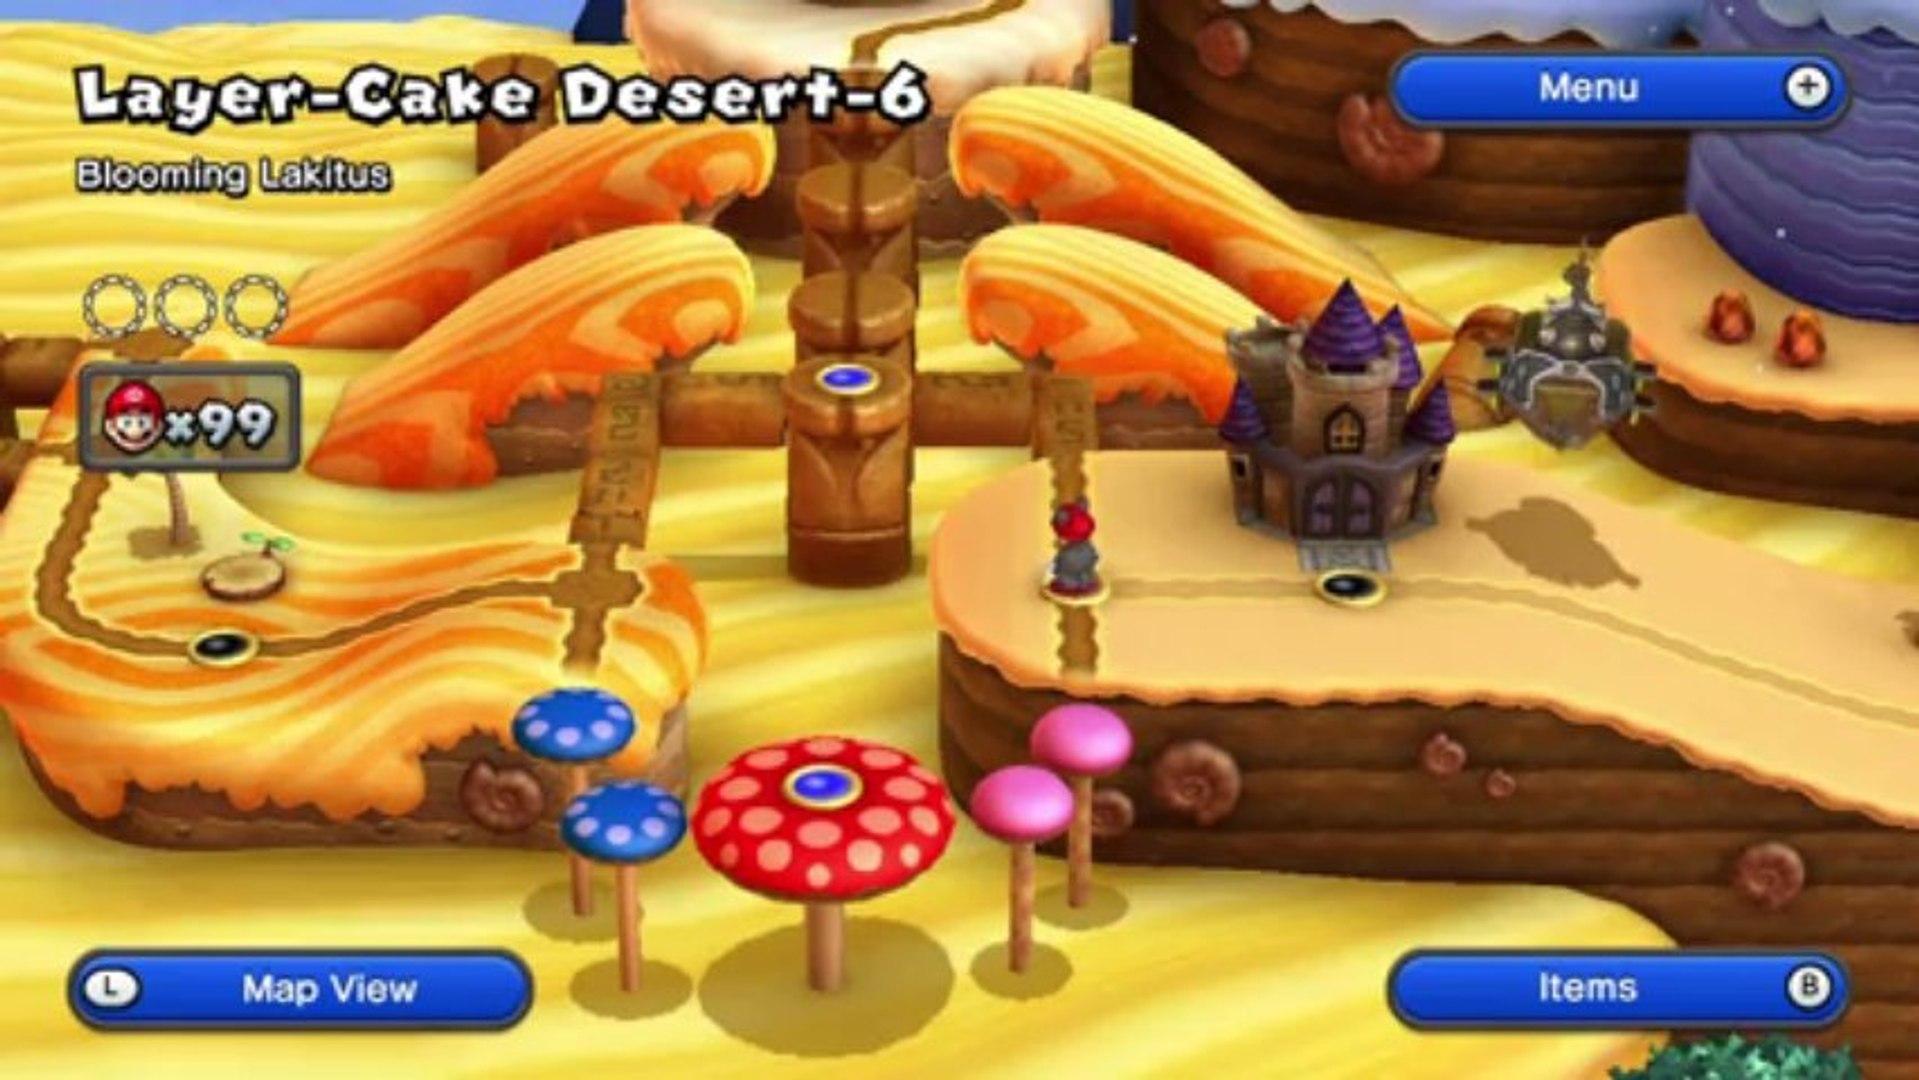 New Super Mario Bros U Walkthrough 13 Layer Cake Desert 5 All Star Coins Hd 1080p Wii U Video Dailymotion